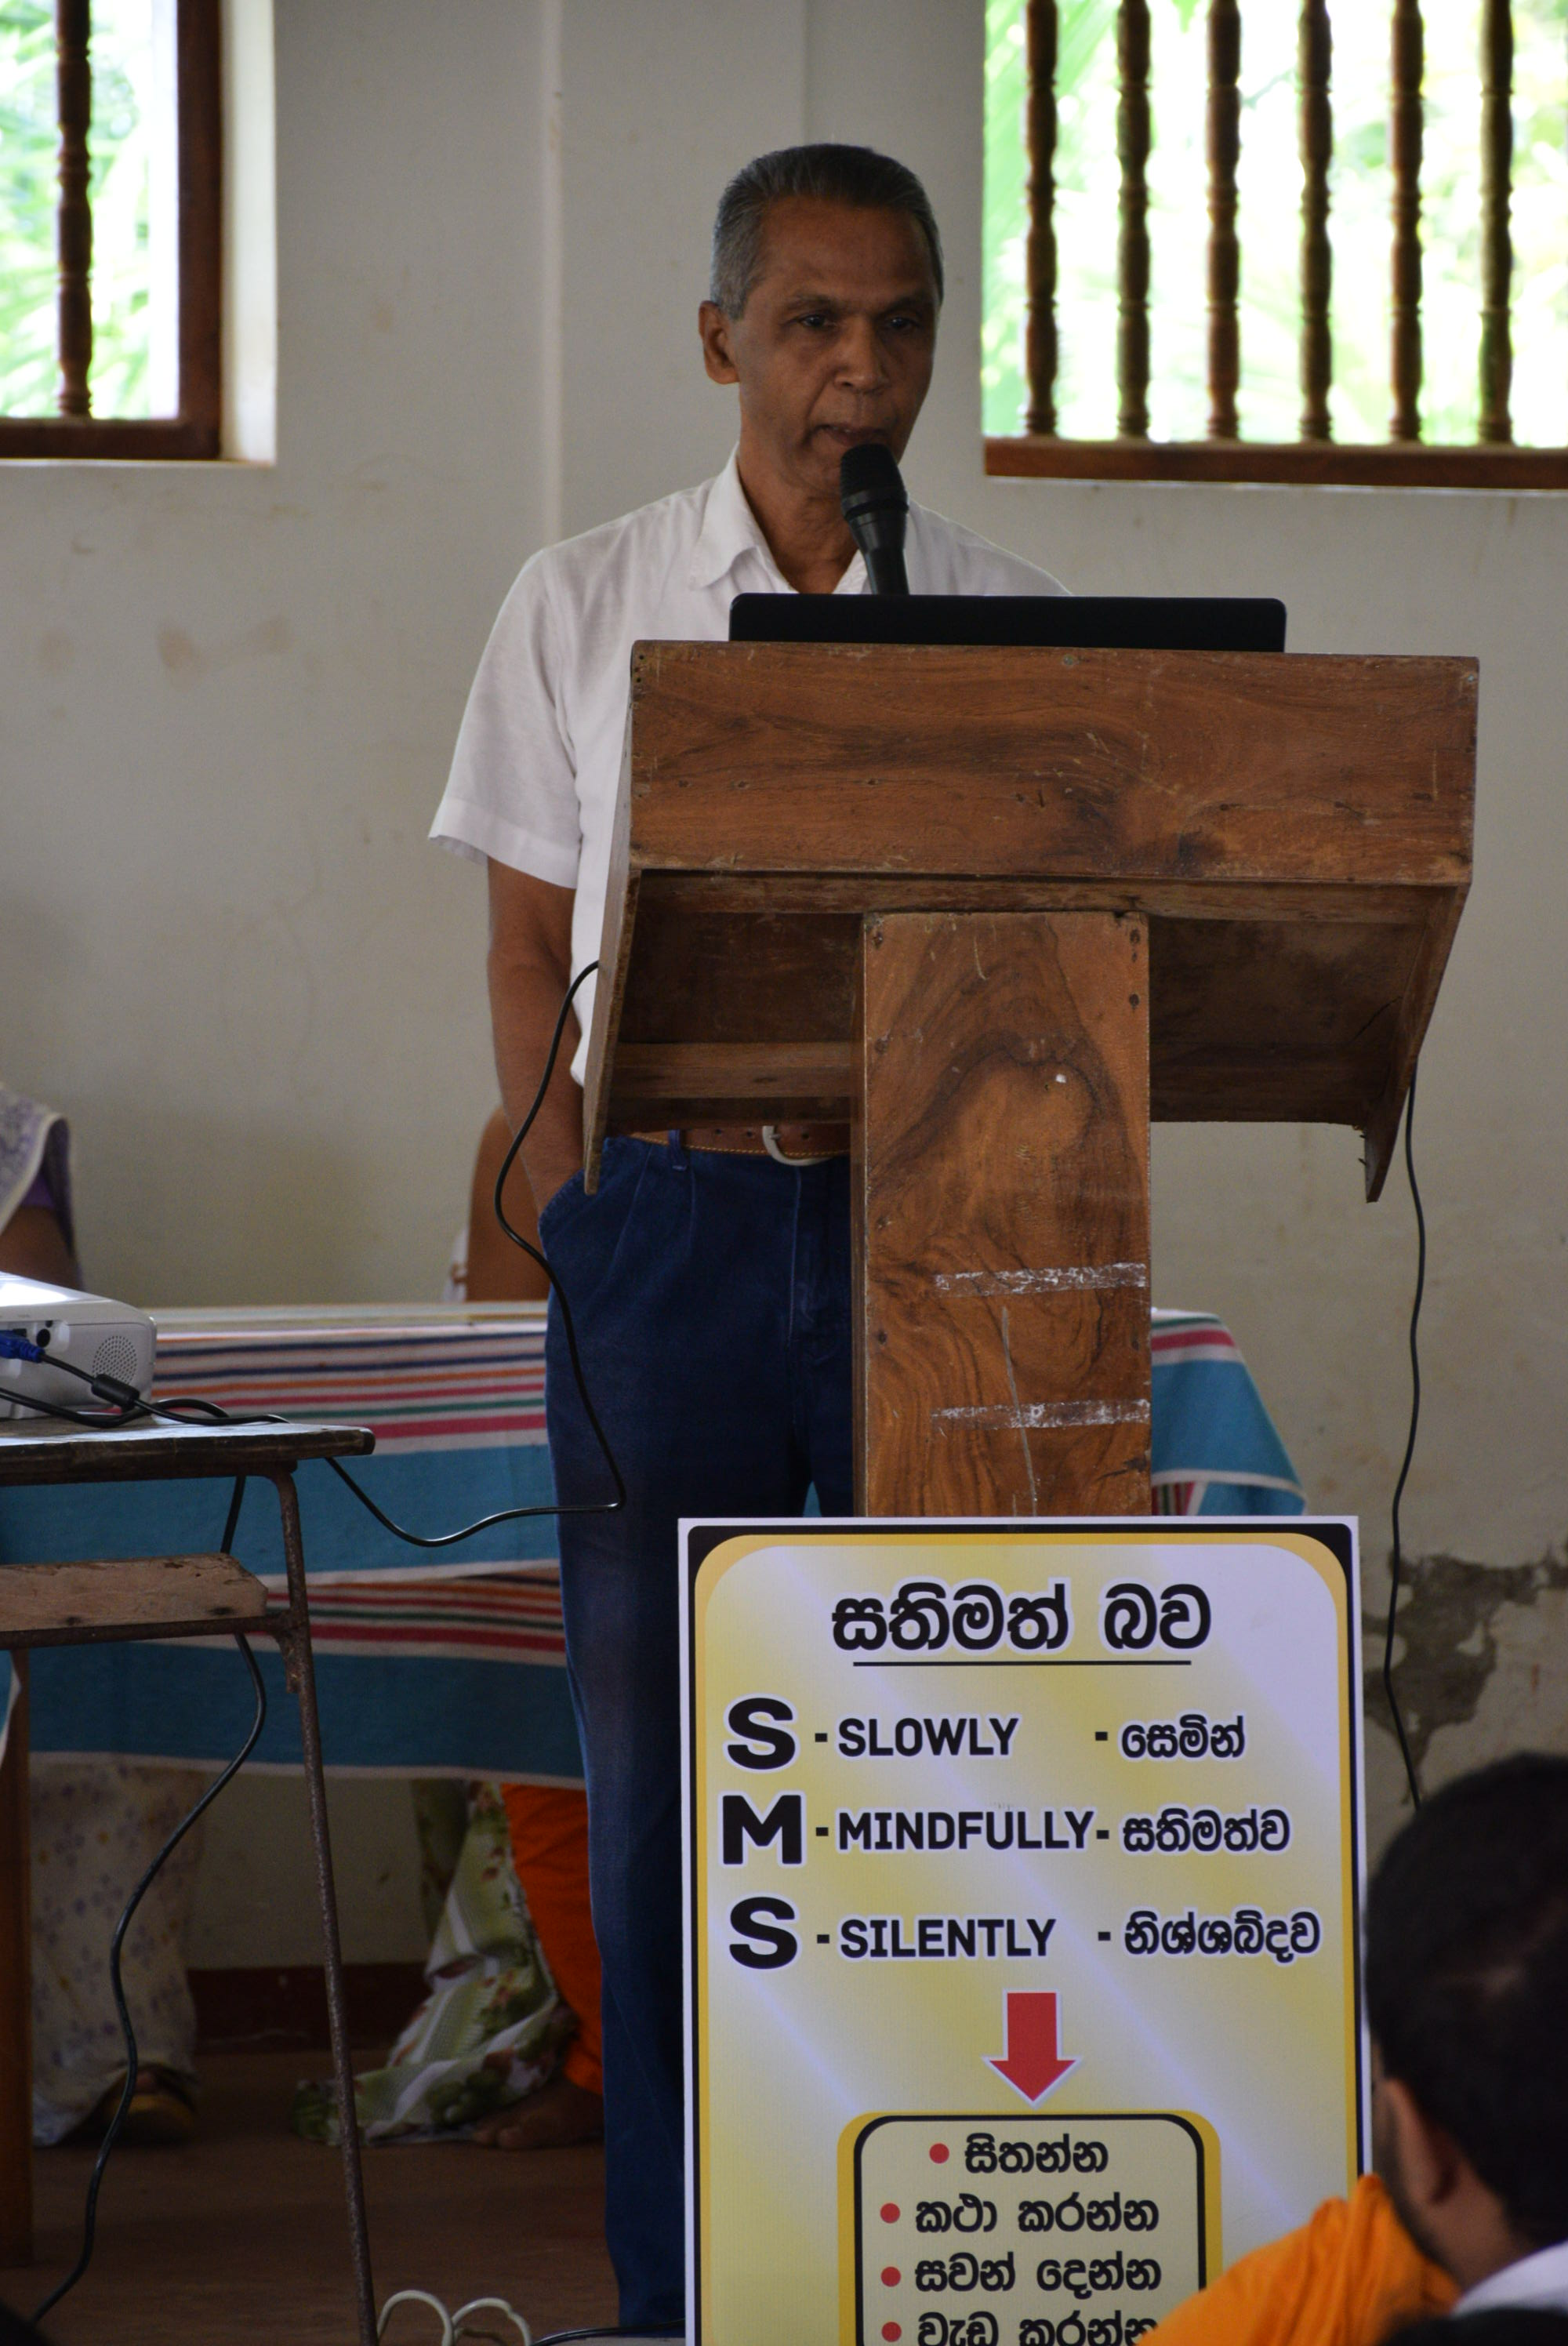 Sati Pasala Mindfulness Programe for Principals and Teachers of Southern Province (3)